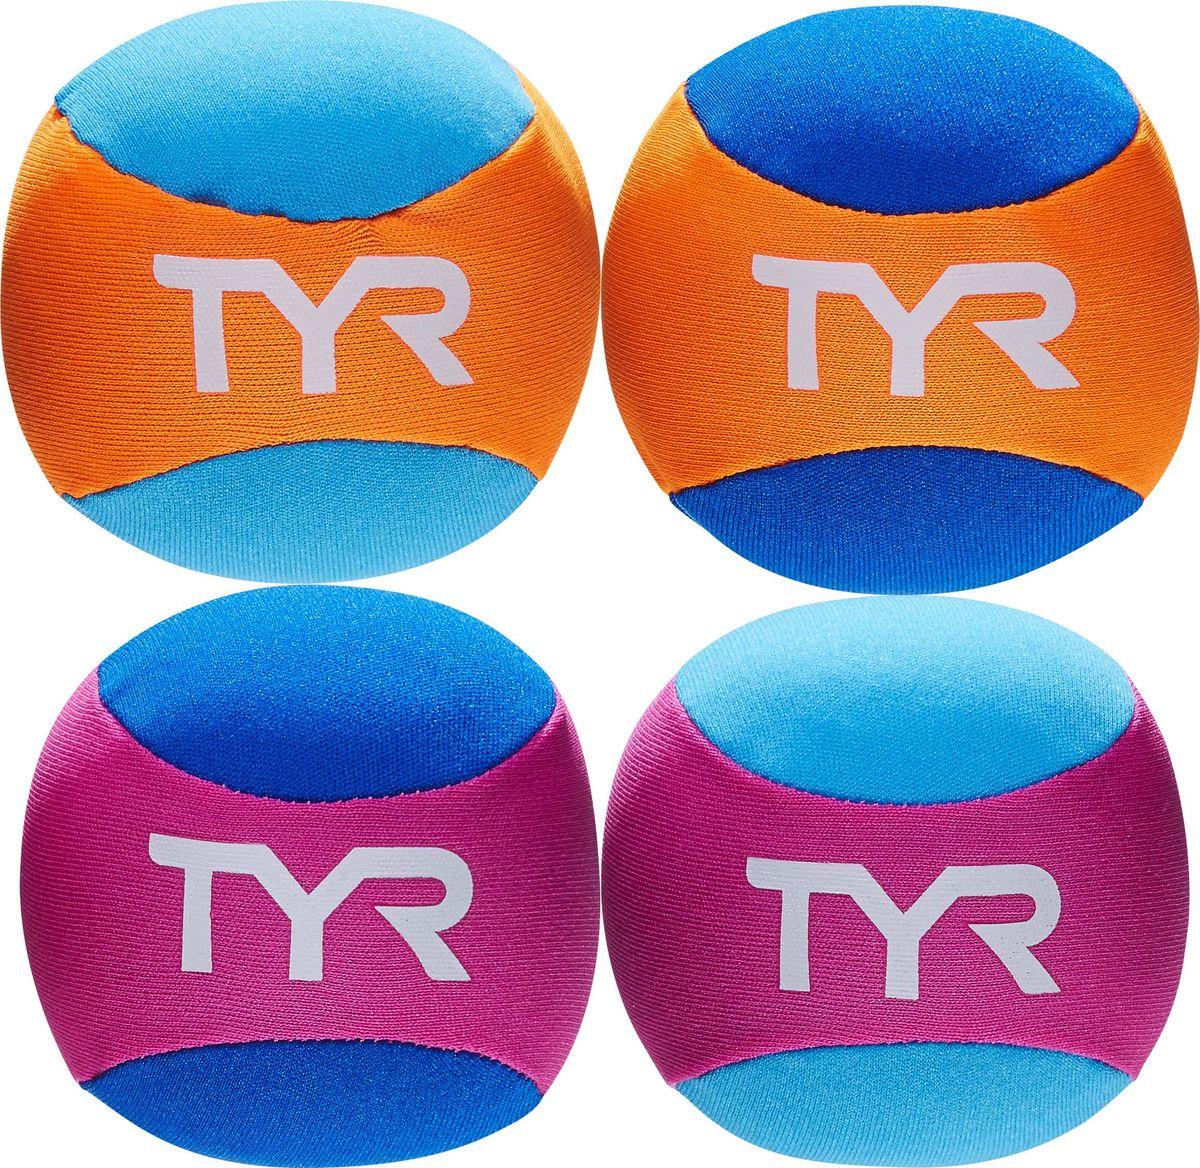 Мяч TYR  Kids' Pool Balls , цвет: мультиколор, 4 шт. LSTSBLS - Плавание